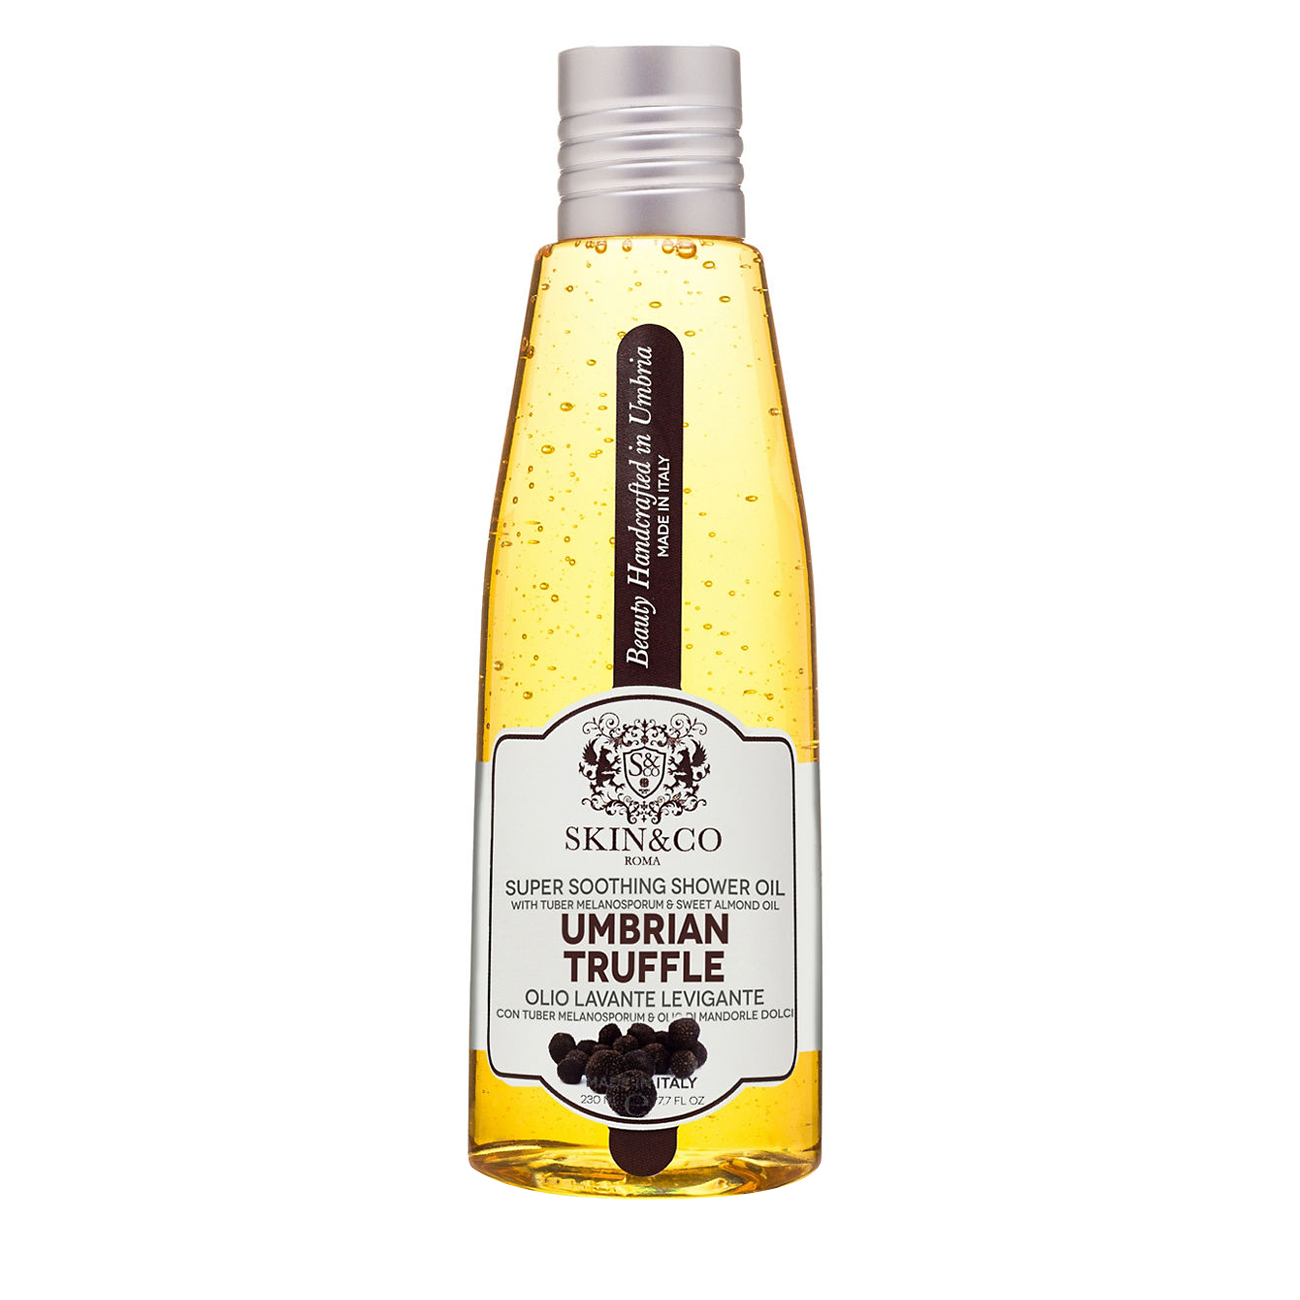 Umbrian Truffle Super Soothing Shower Oil 230ml Skin&Co Roma imagine 2021 bestvalue.eu